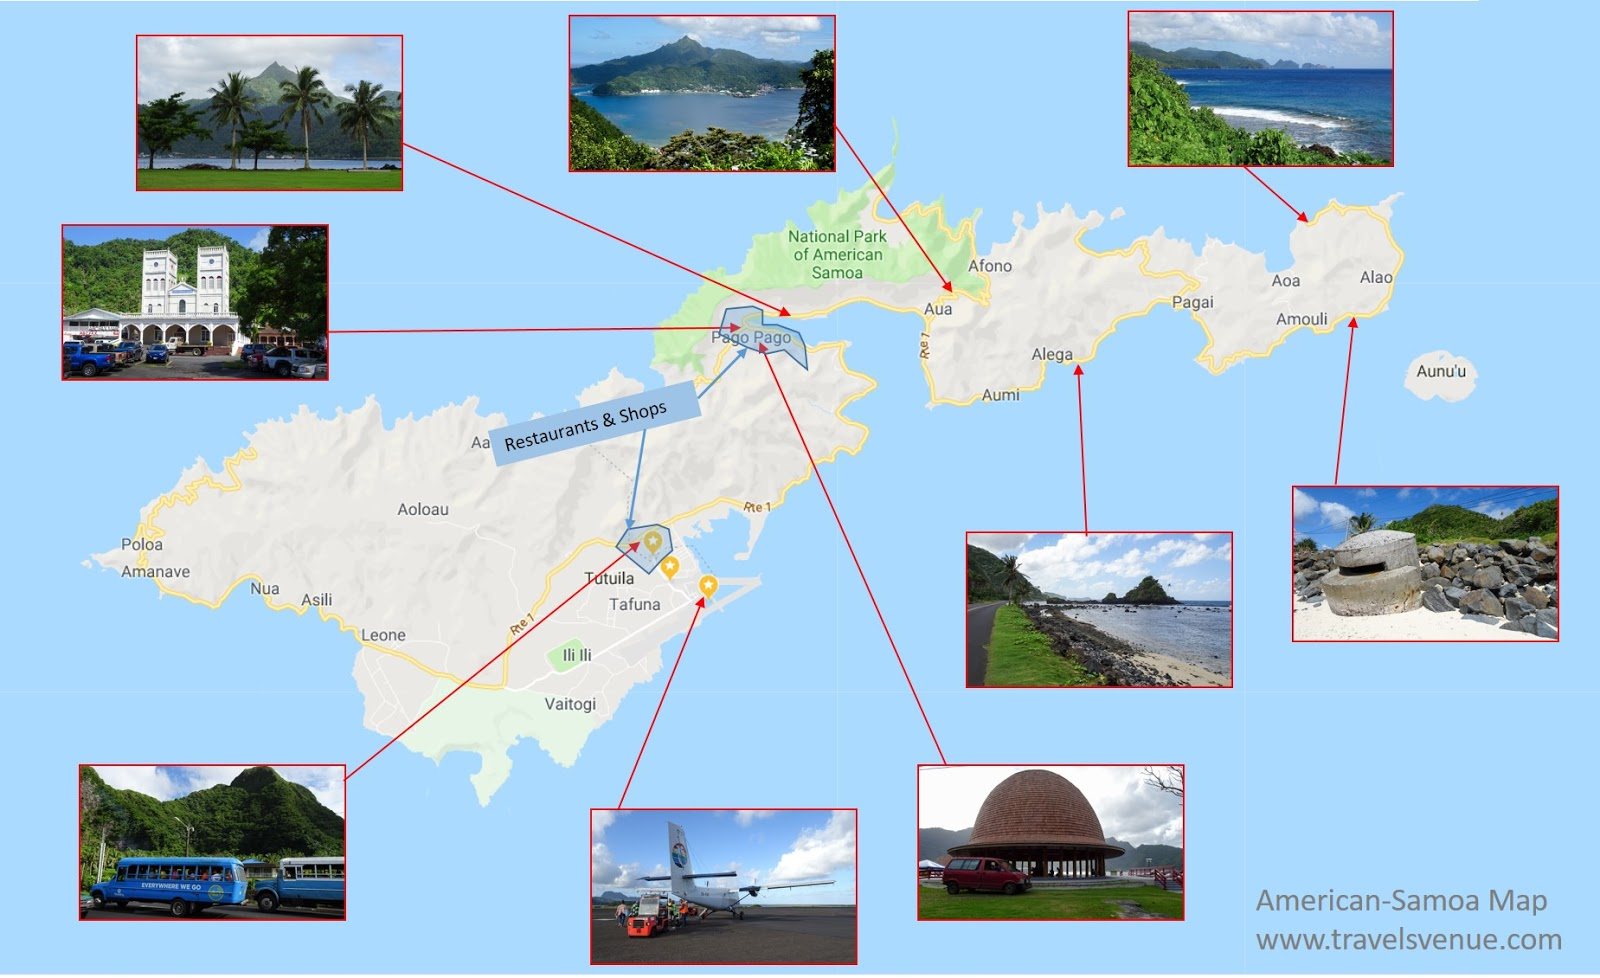 American-Samoa - The